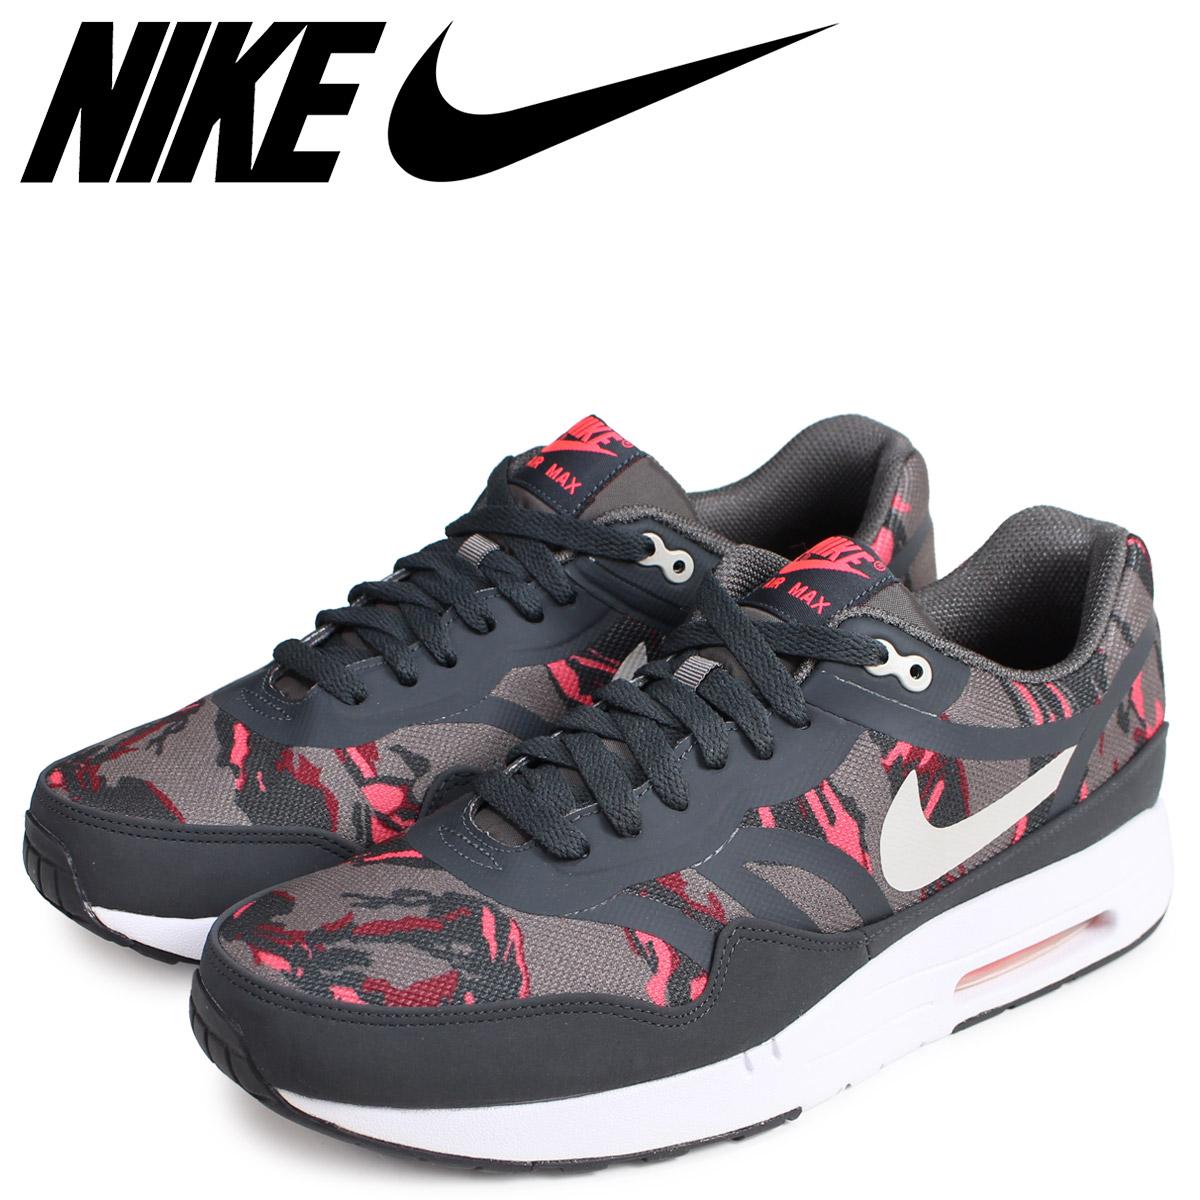 332b77c5d10e Sugar Online Shop  NIKE Kie Ney AMAX 1 sneakers men AIR MAX 1 ...